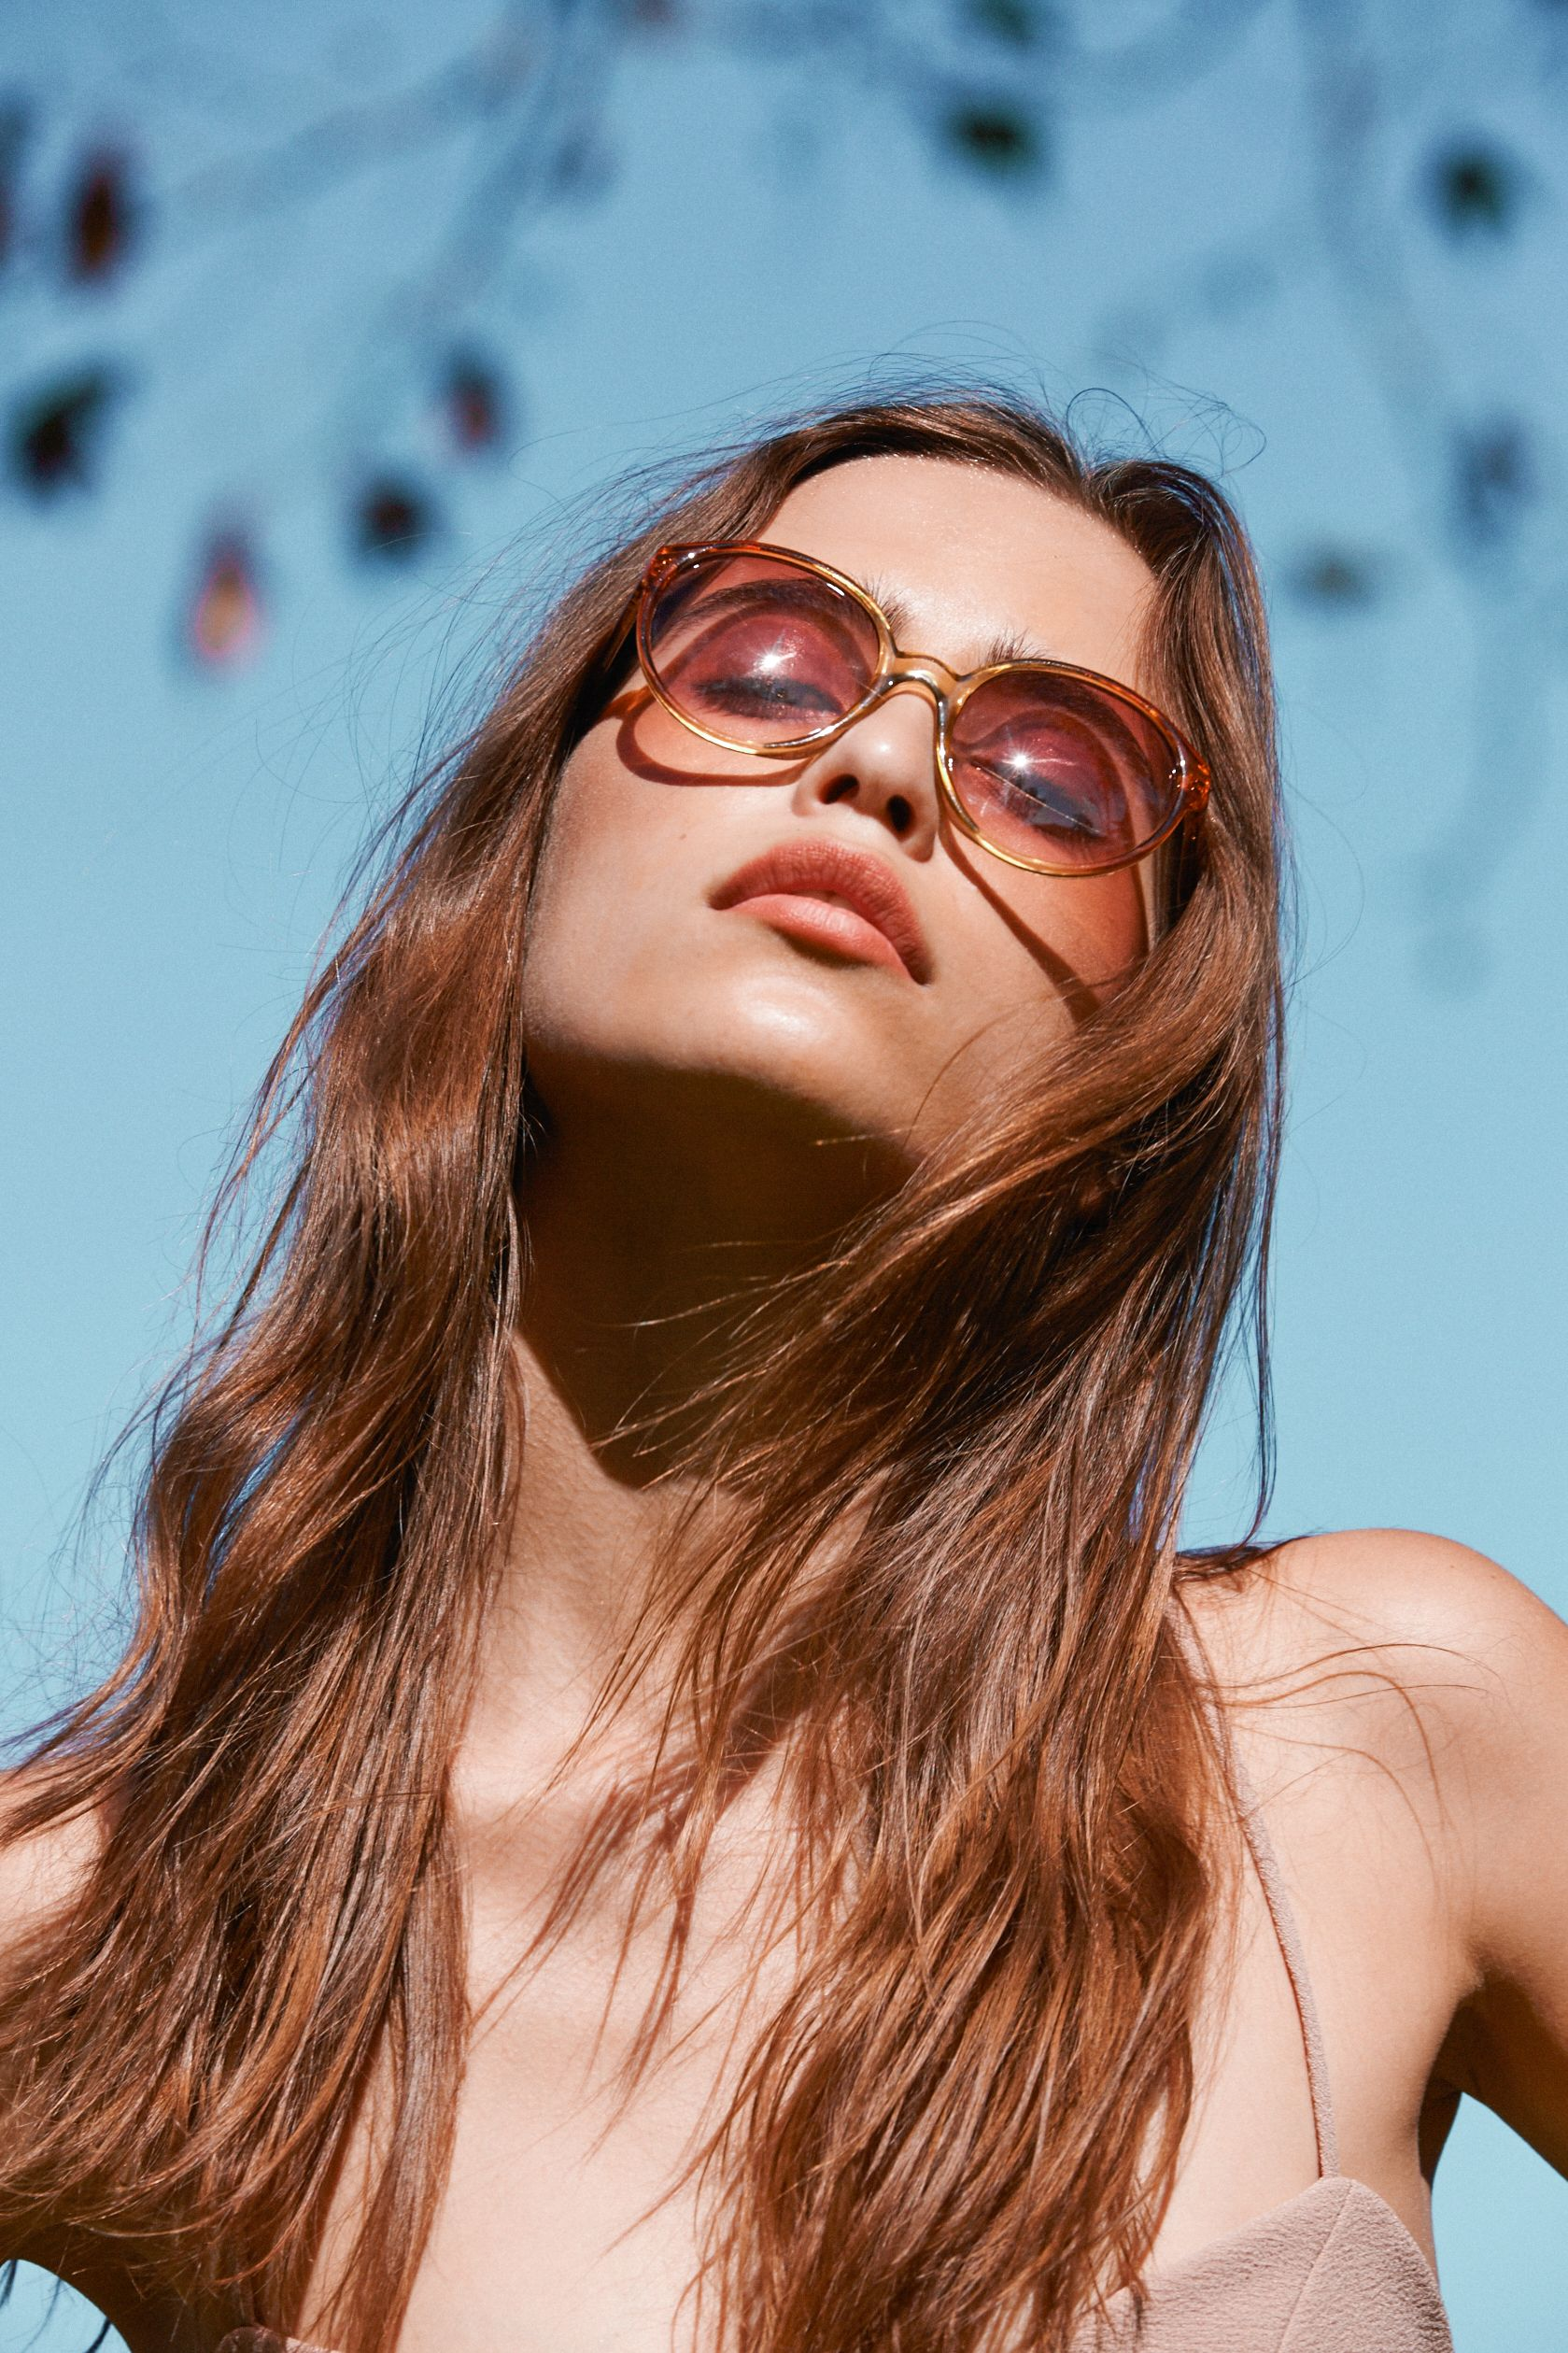 Sexy Girls With Sunglasses Vol.21 - Barnorama